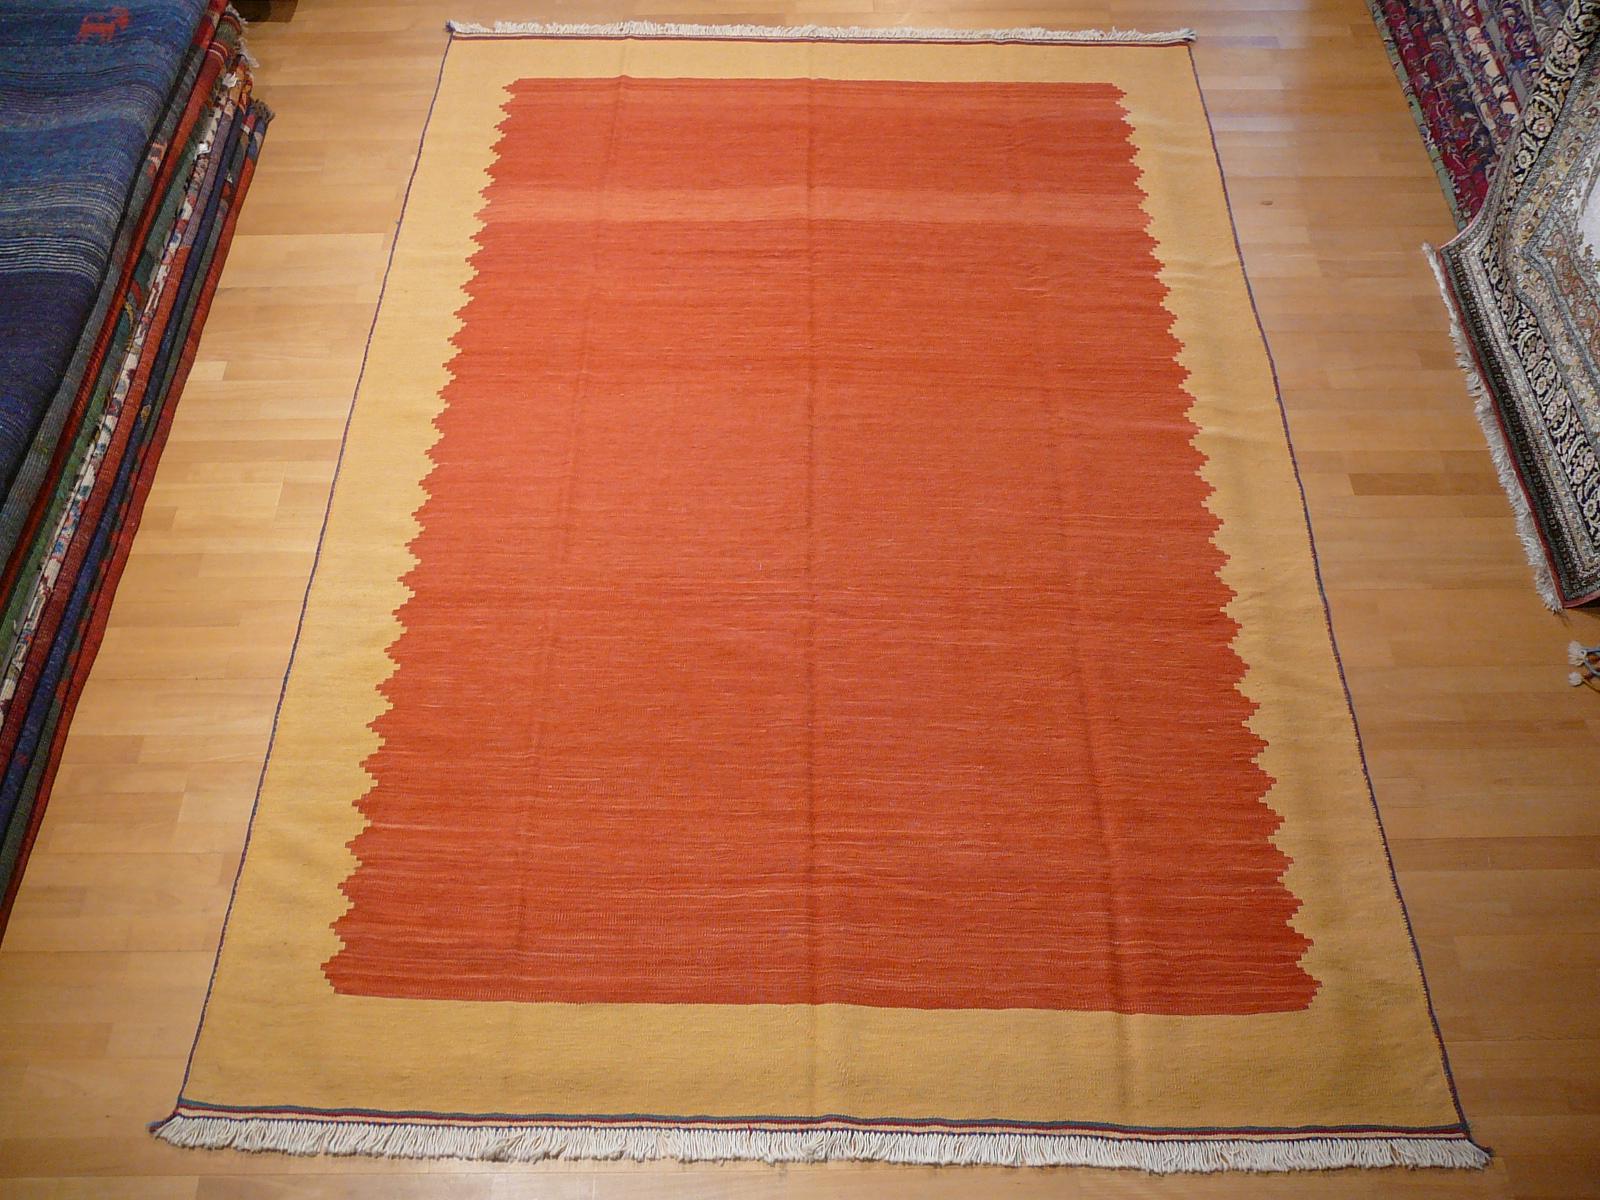 12918 kilim rug iran persia 9 7 x 6 5 ft 296 x 199 cm persian rugs oriental rugs silk. Black Bedroom Furniture Sets. Home Design Ideas